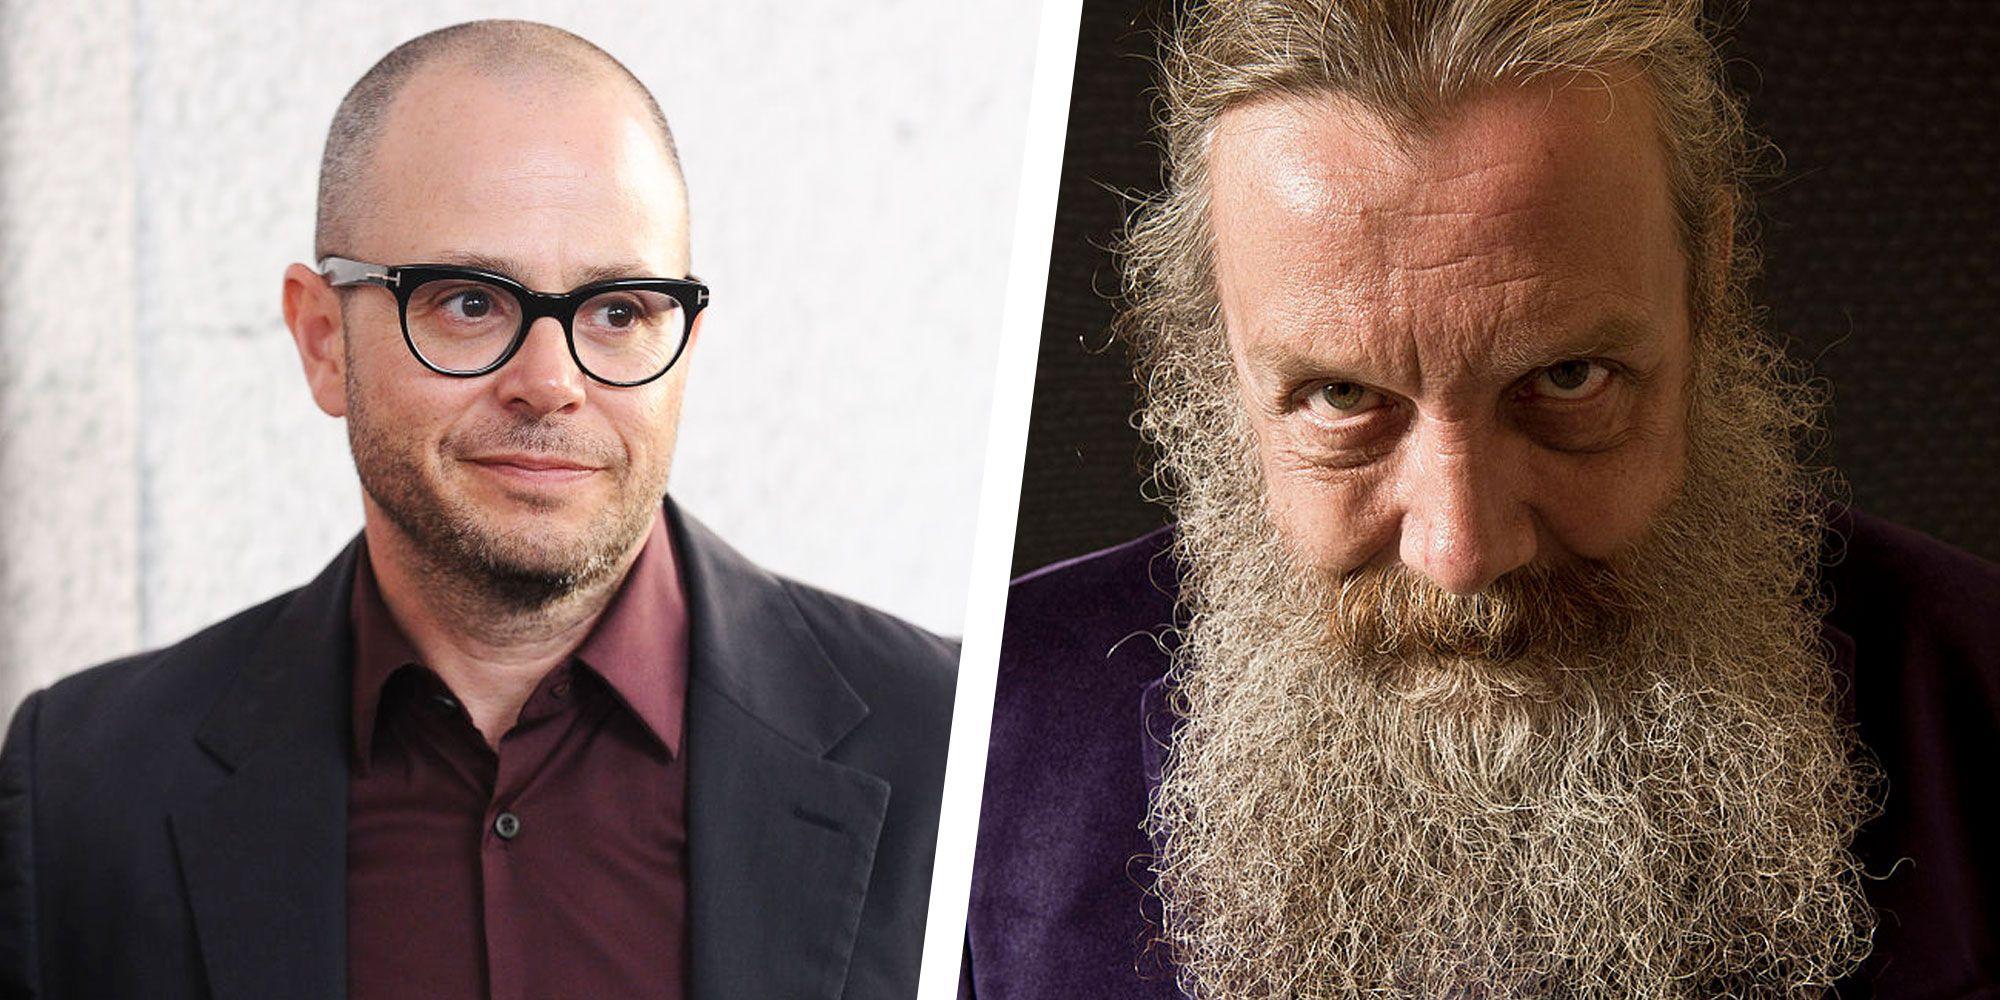 Watchmen Showrunner Damon Lindelof Says Comic Writer Alan Moore Put a 'Curse' on Him